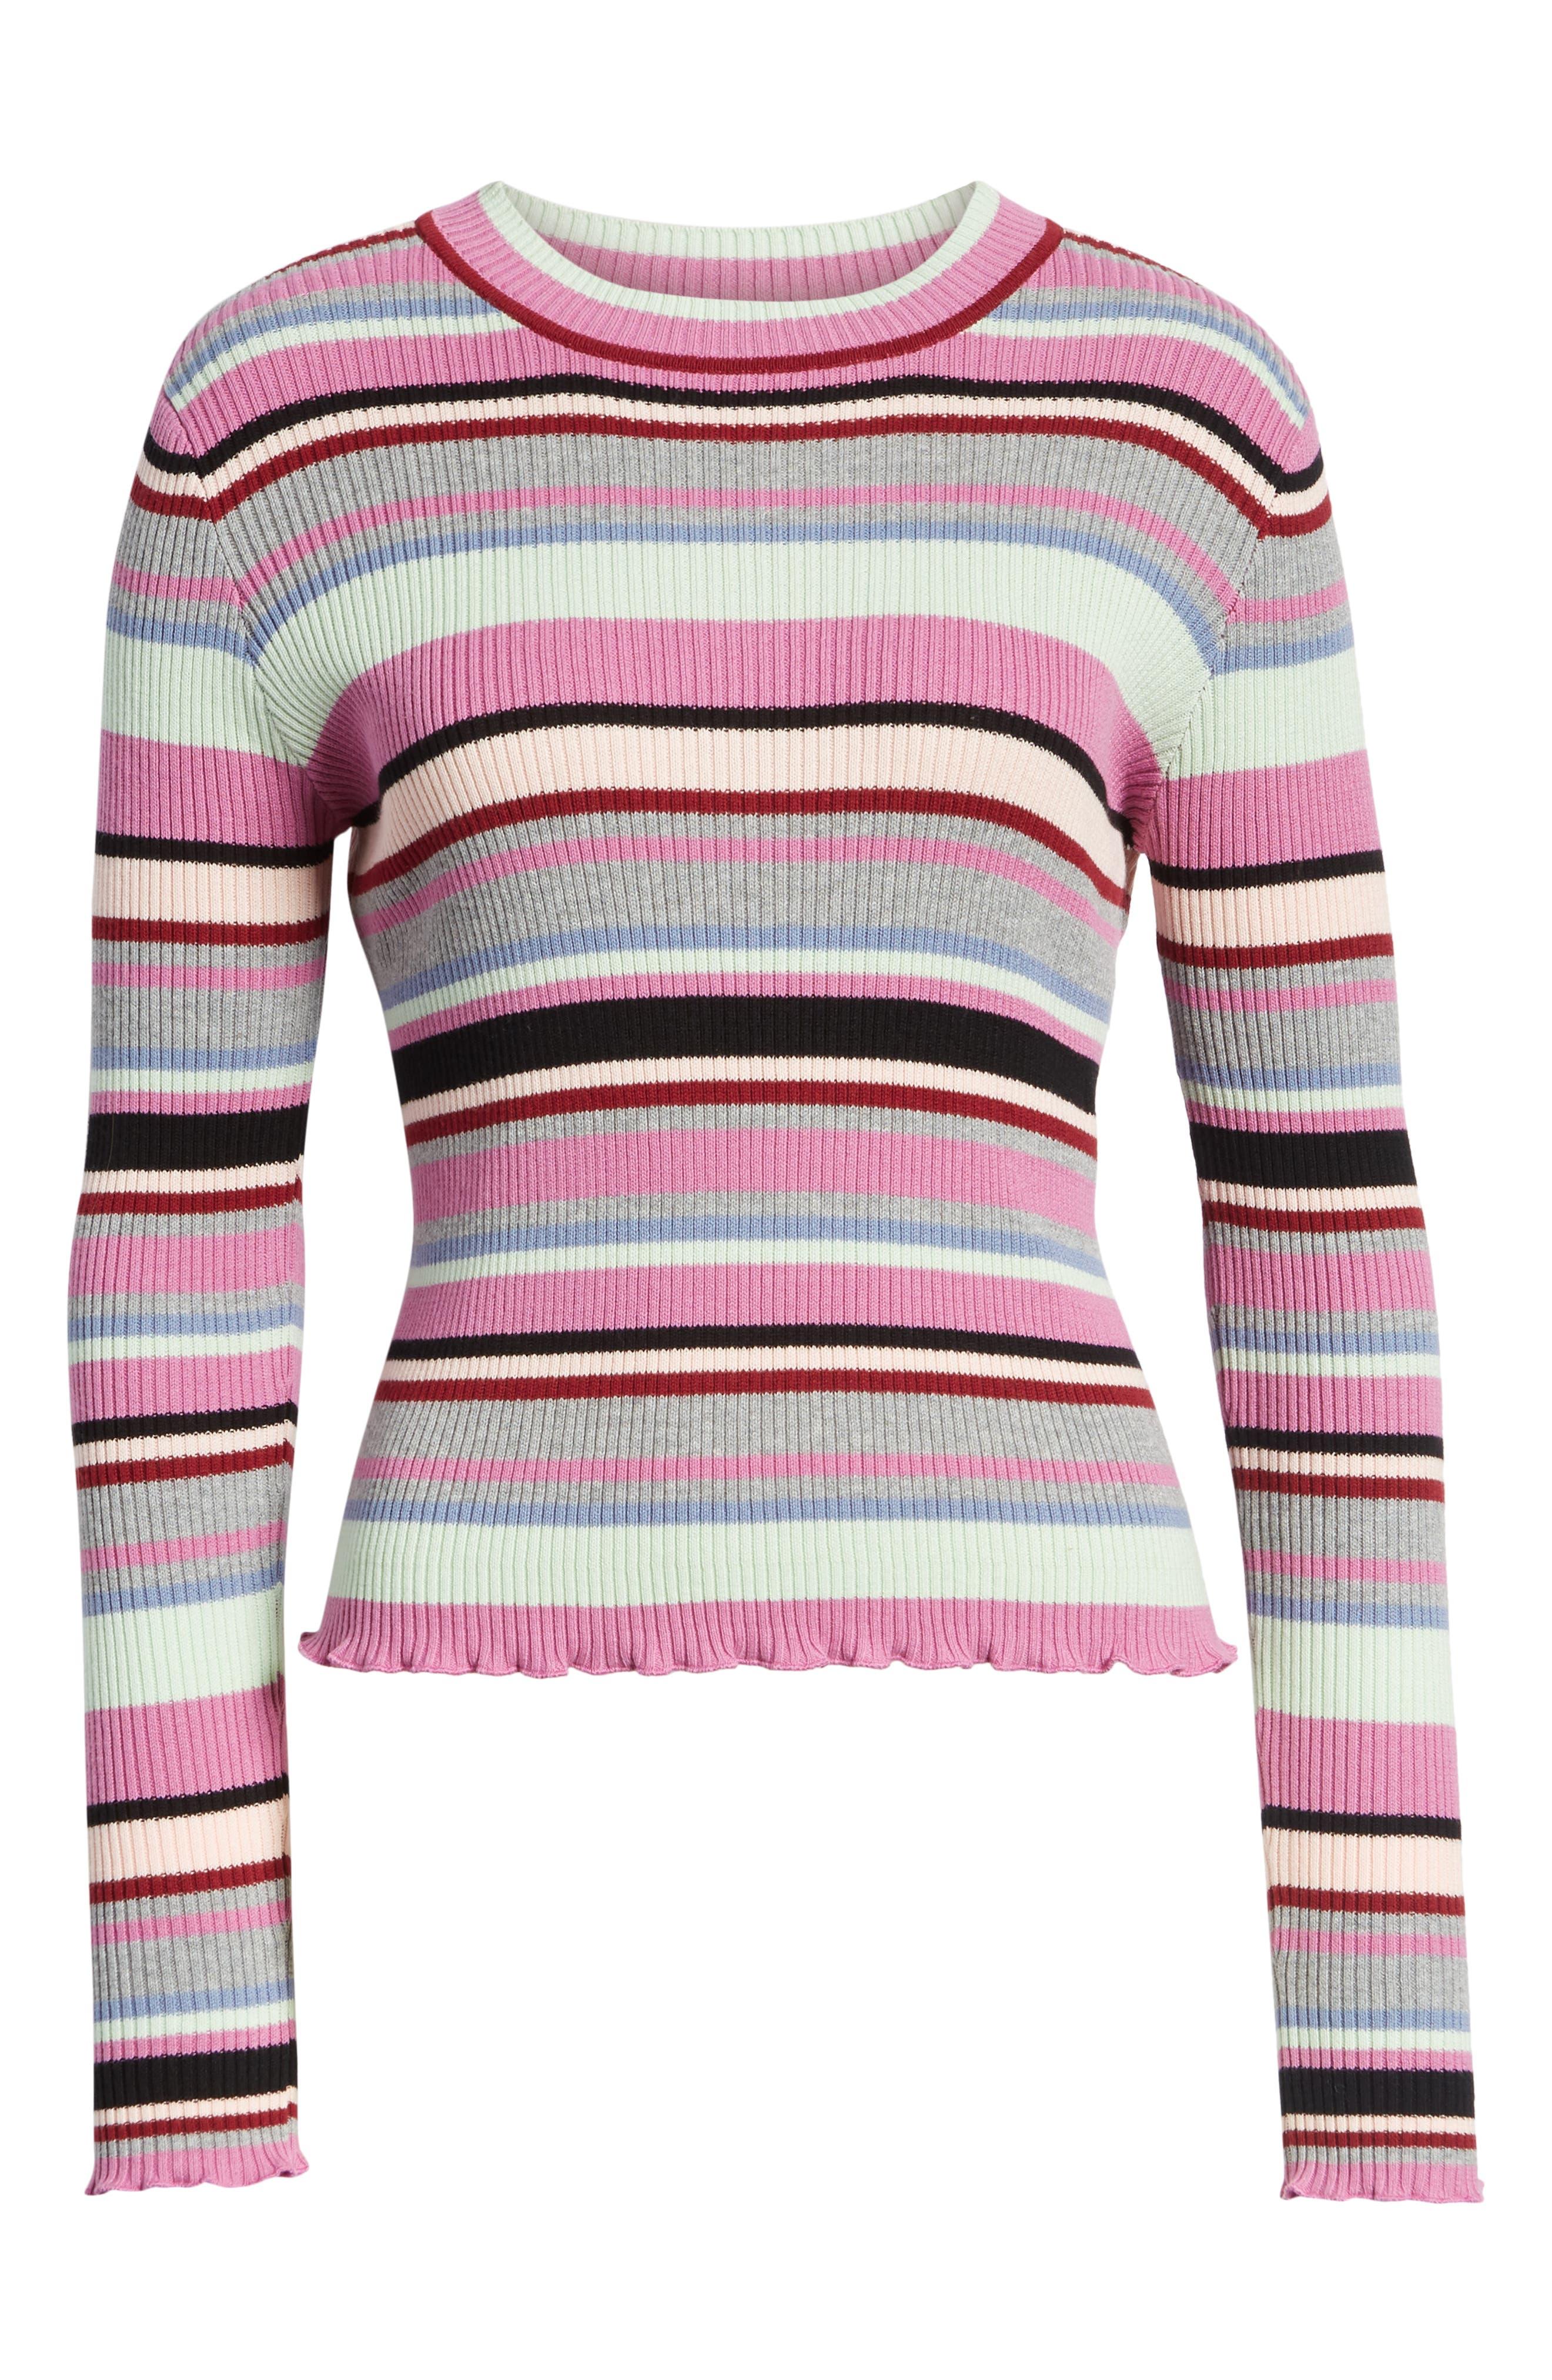 Ribbed Lettuce Edge Stripe Sweater,                             Alternate thumbnail 7, color,                             PURPLE TAFFY KARA MULTI STRIPE